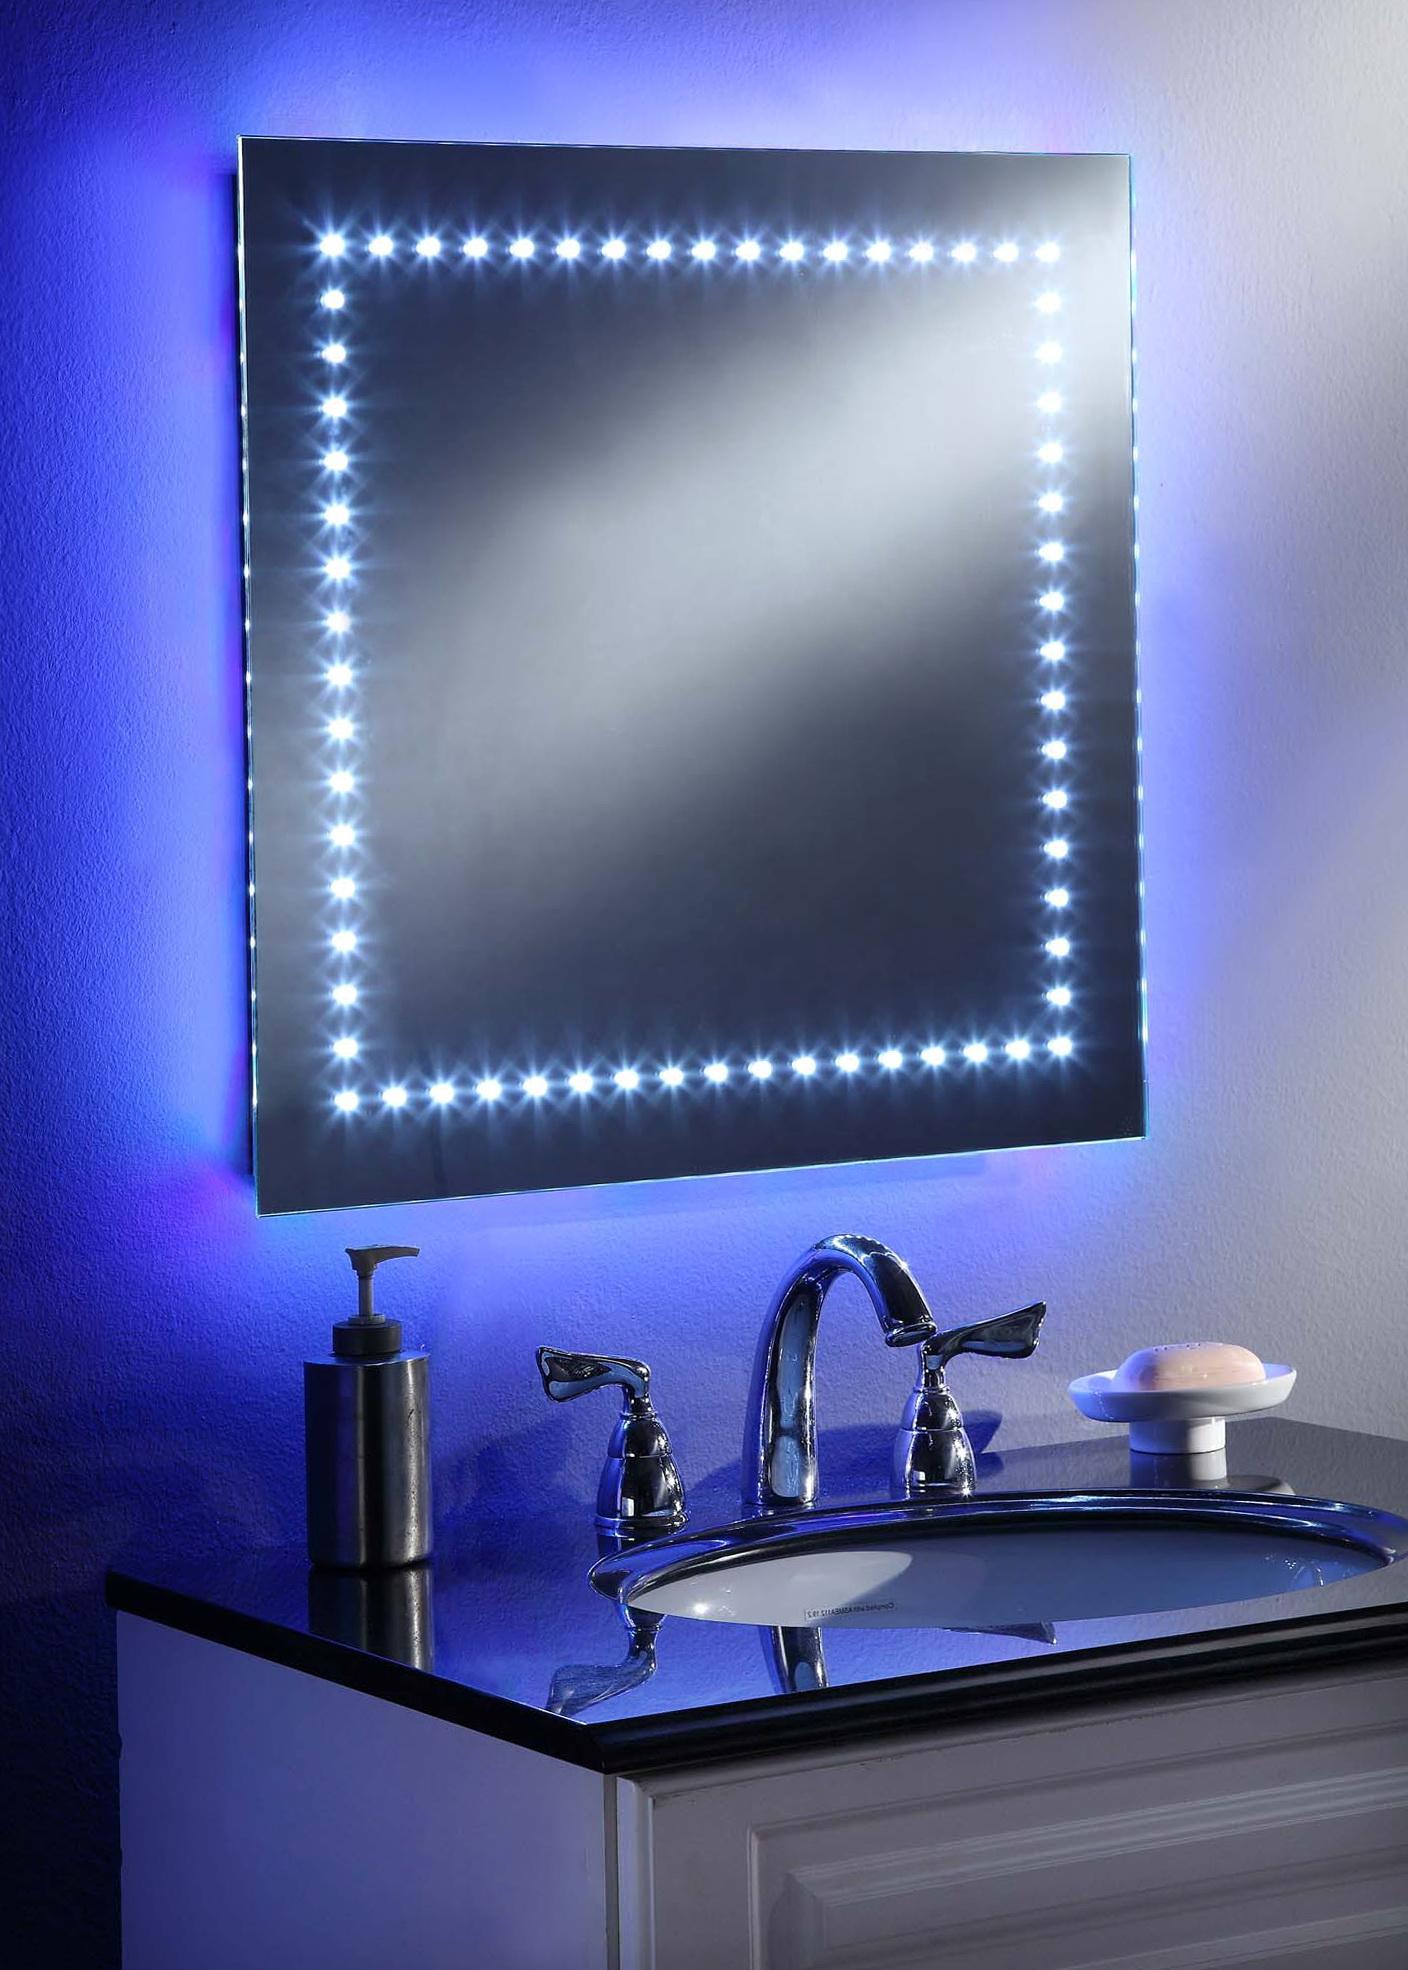 Ikea led bathroom mirror home design ideas - Illuminated bathroom mirrors ikea ...